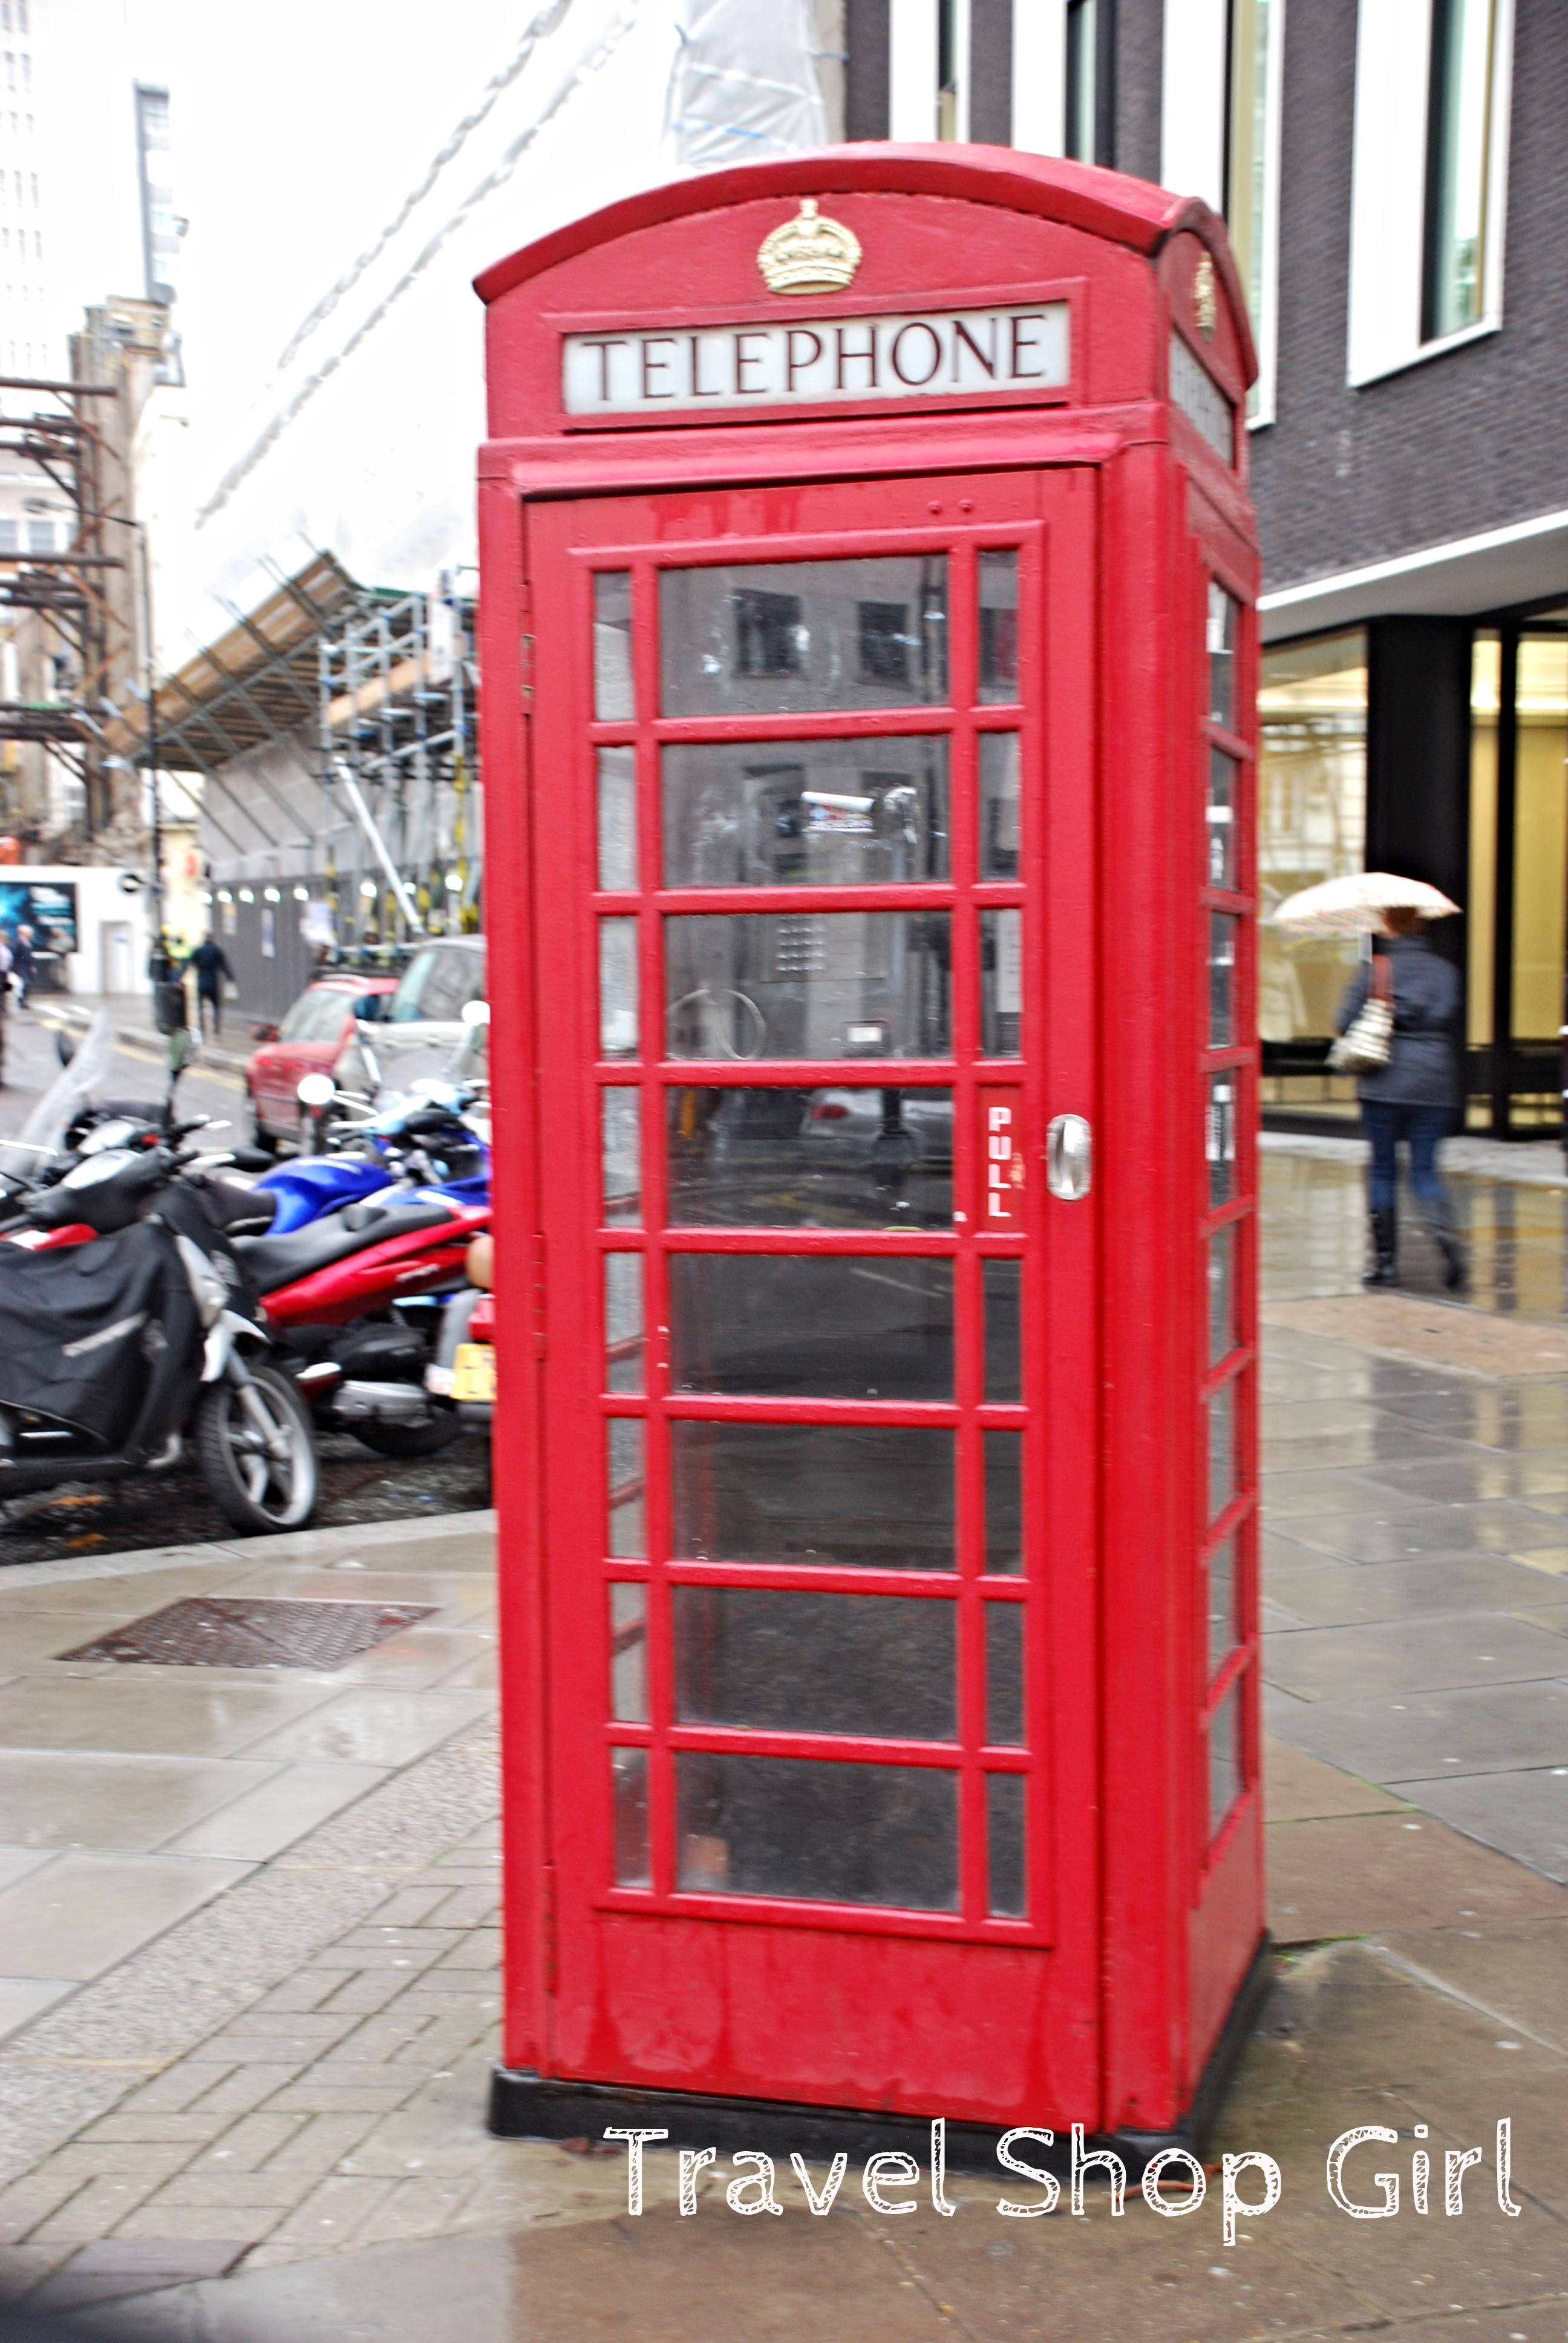 Random Red Images Of London Travel Shop Girl